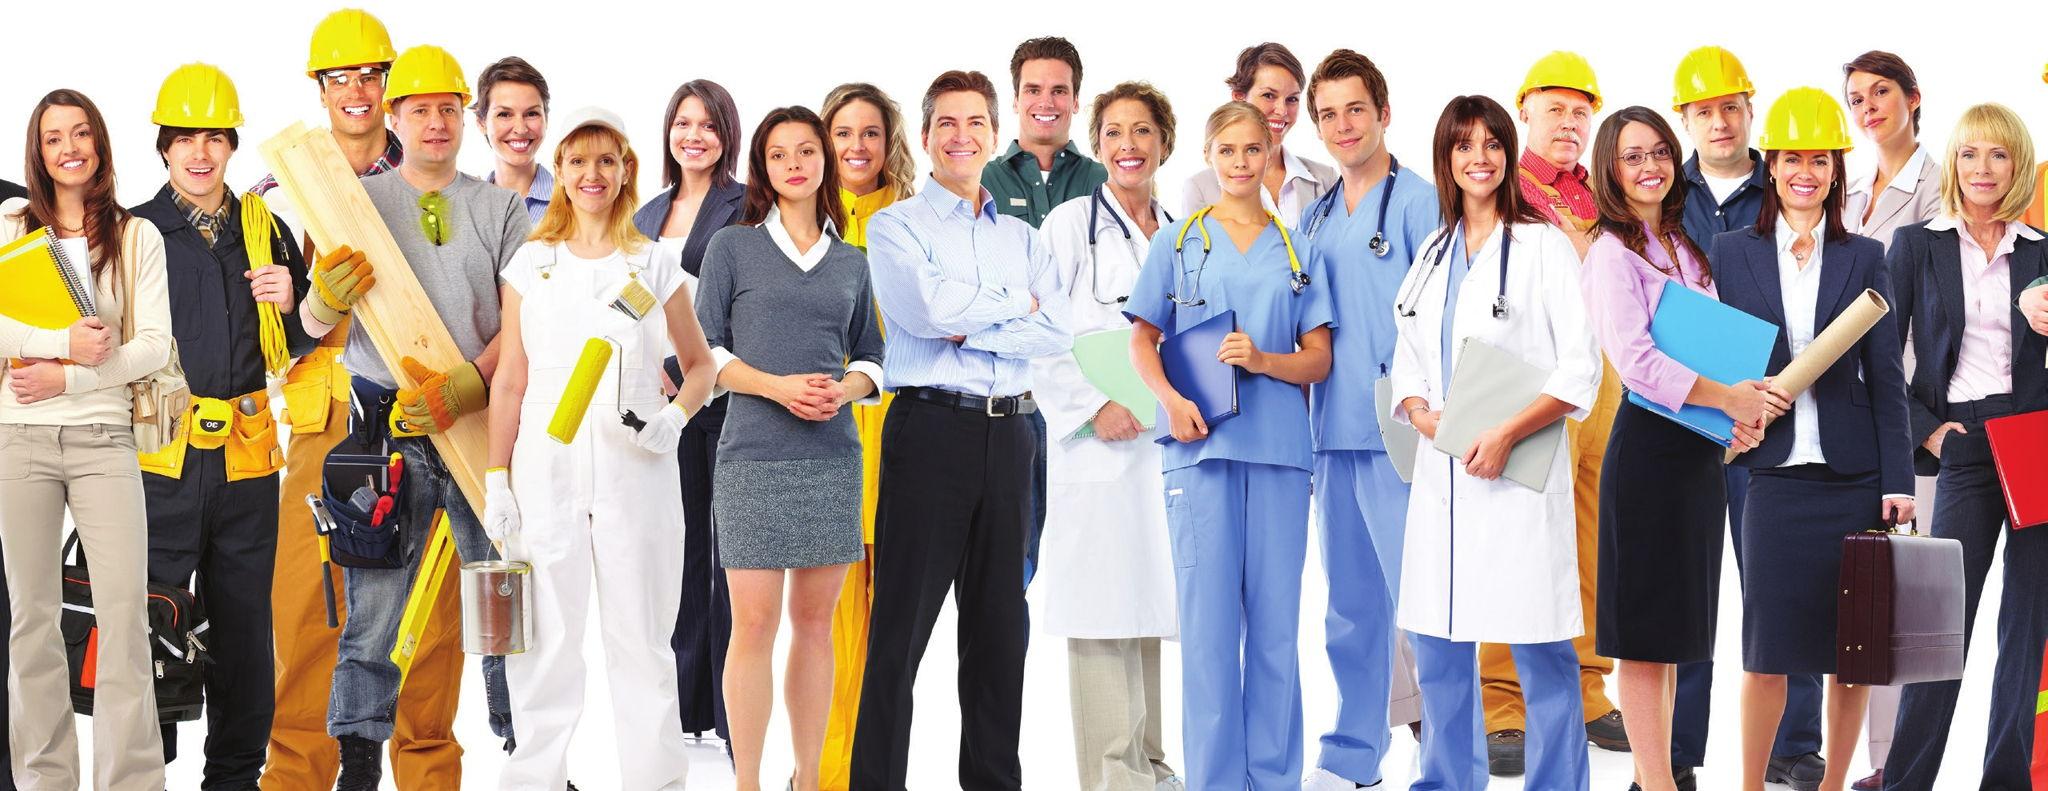 opțiuni pentru angajați